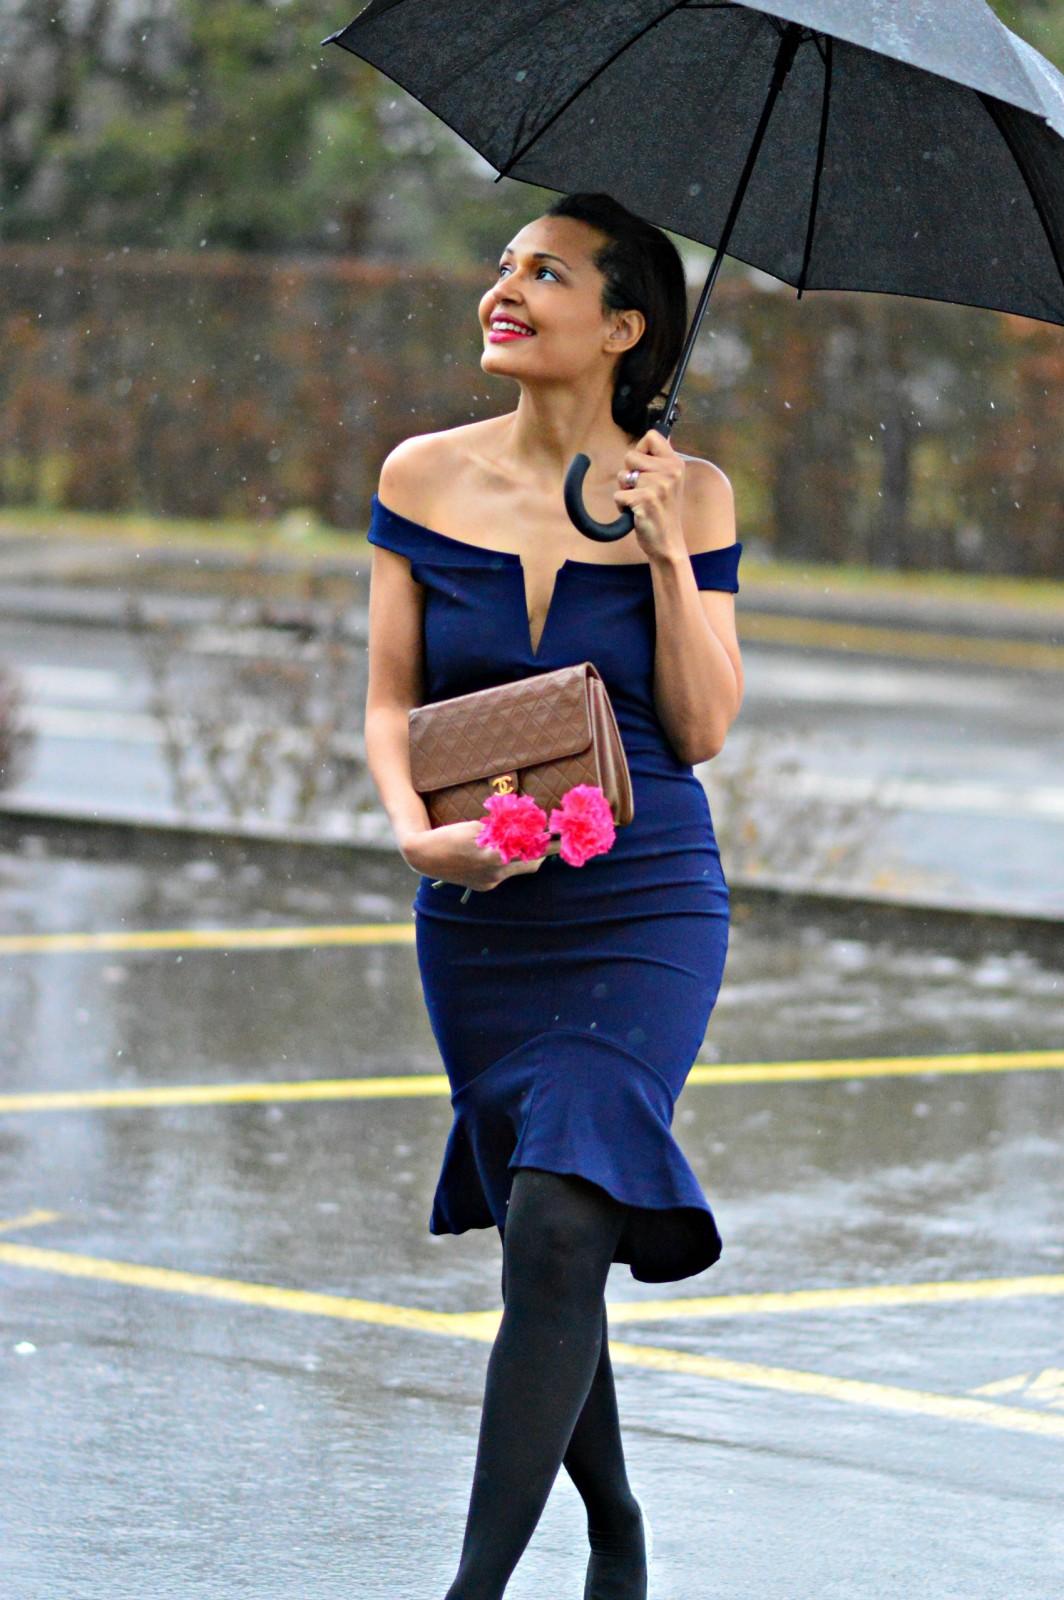 Blue capsule dress